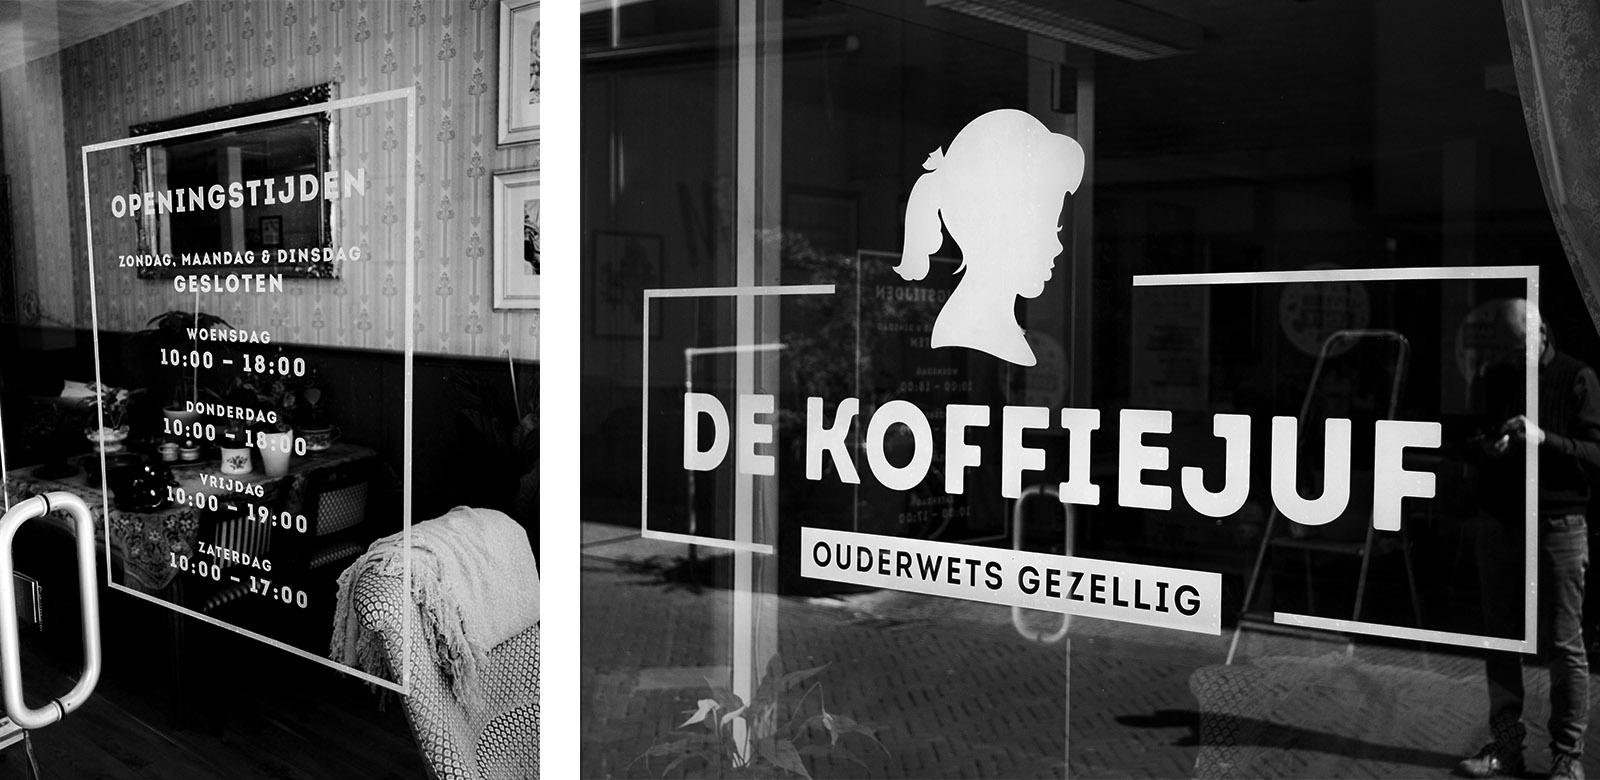 DeKoffieJuf logo koffiezaak huisstijl